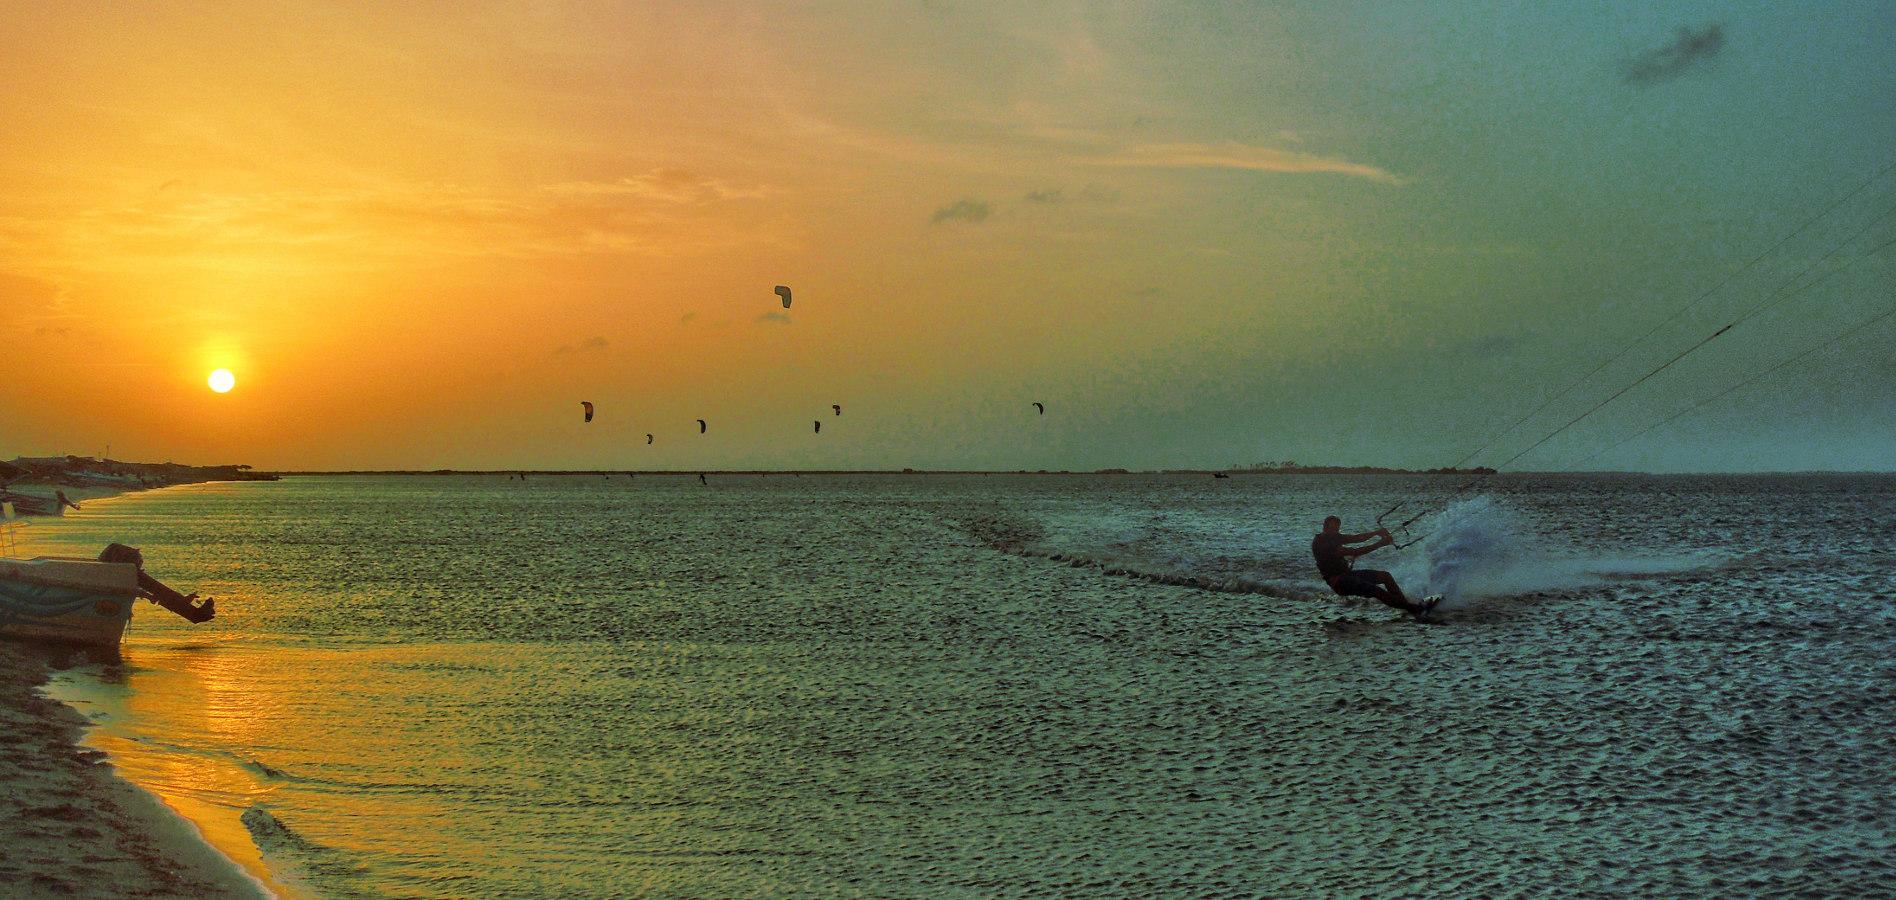 Vellai-magic-spot-Over-night-sunset.jpeg